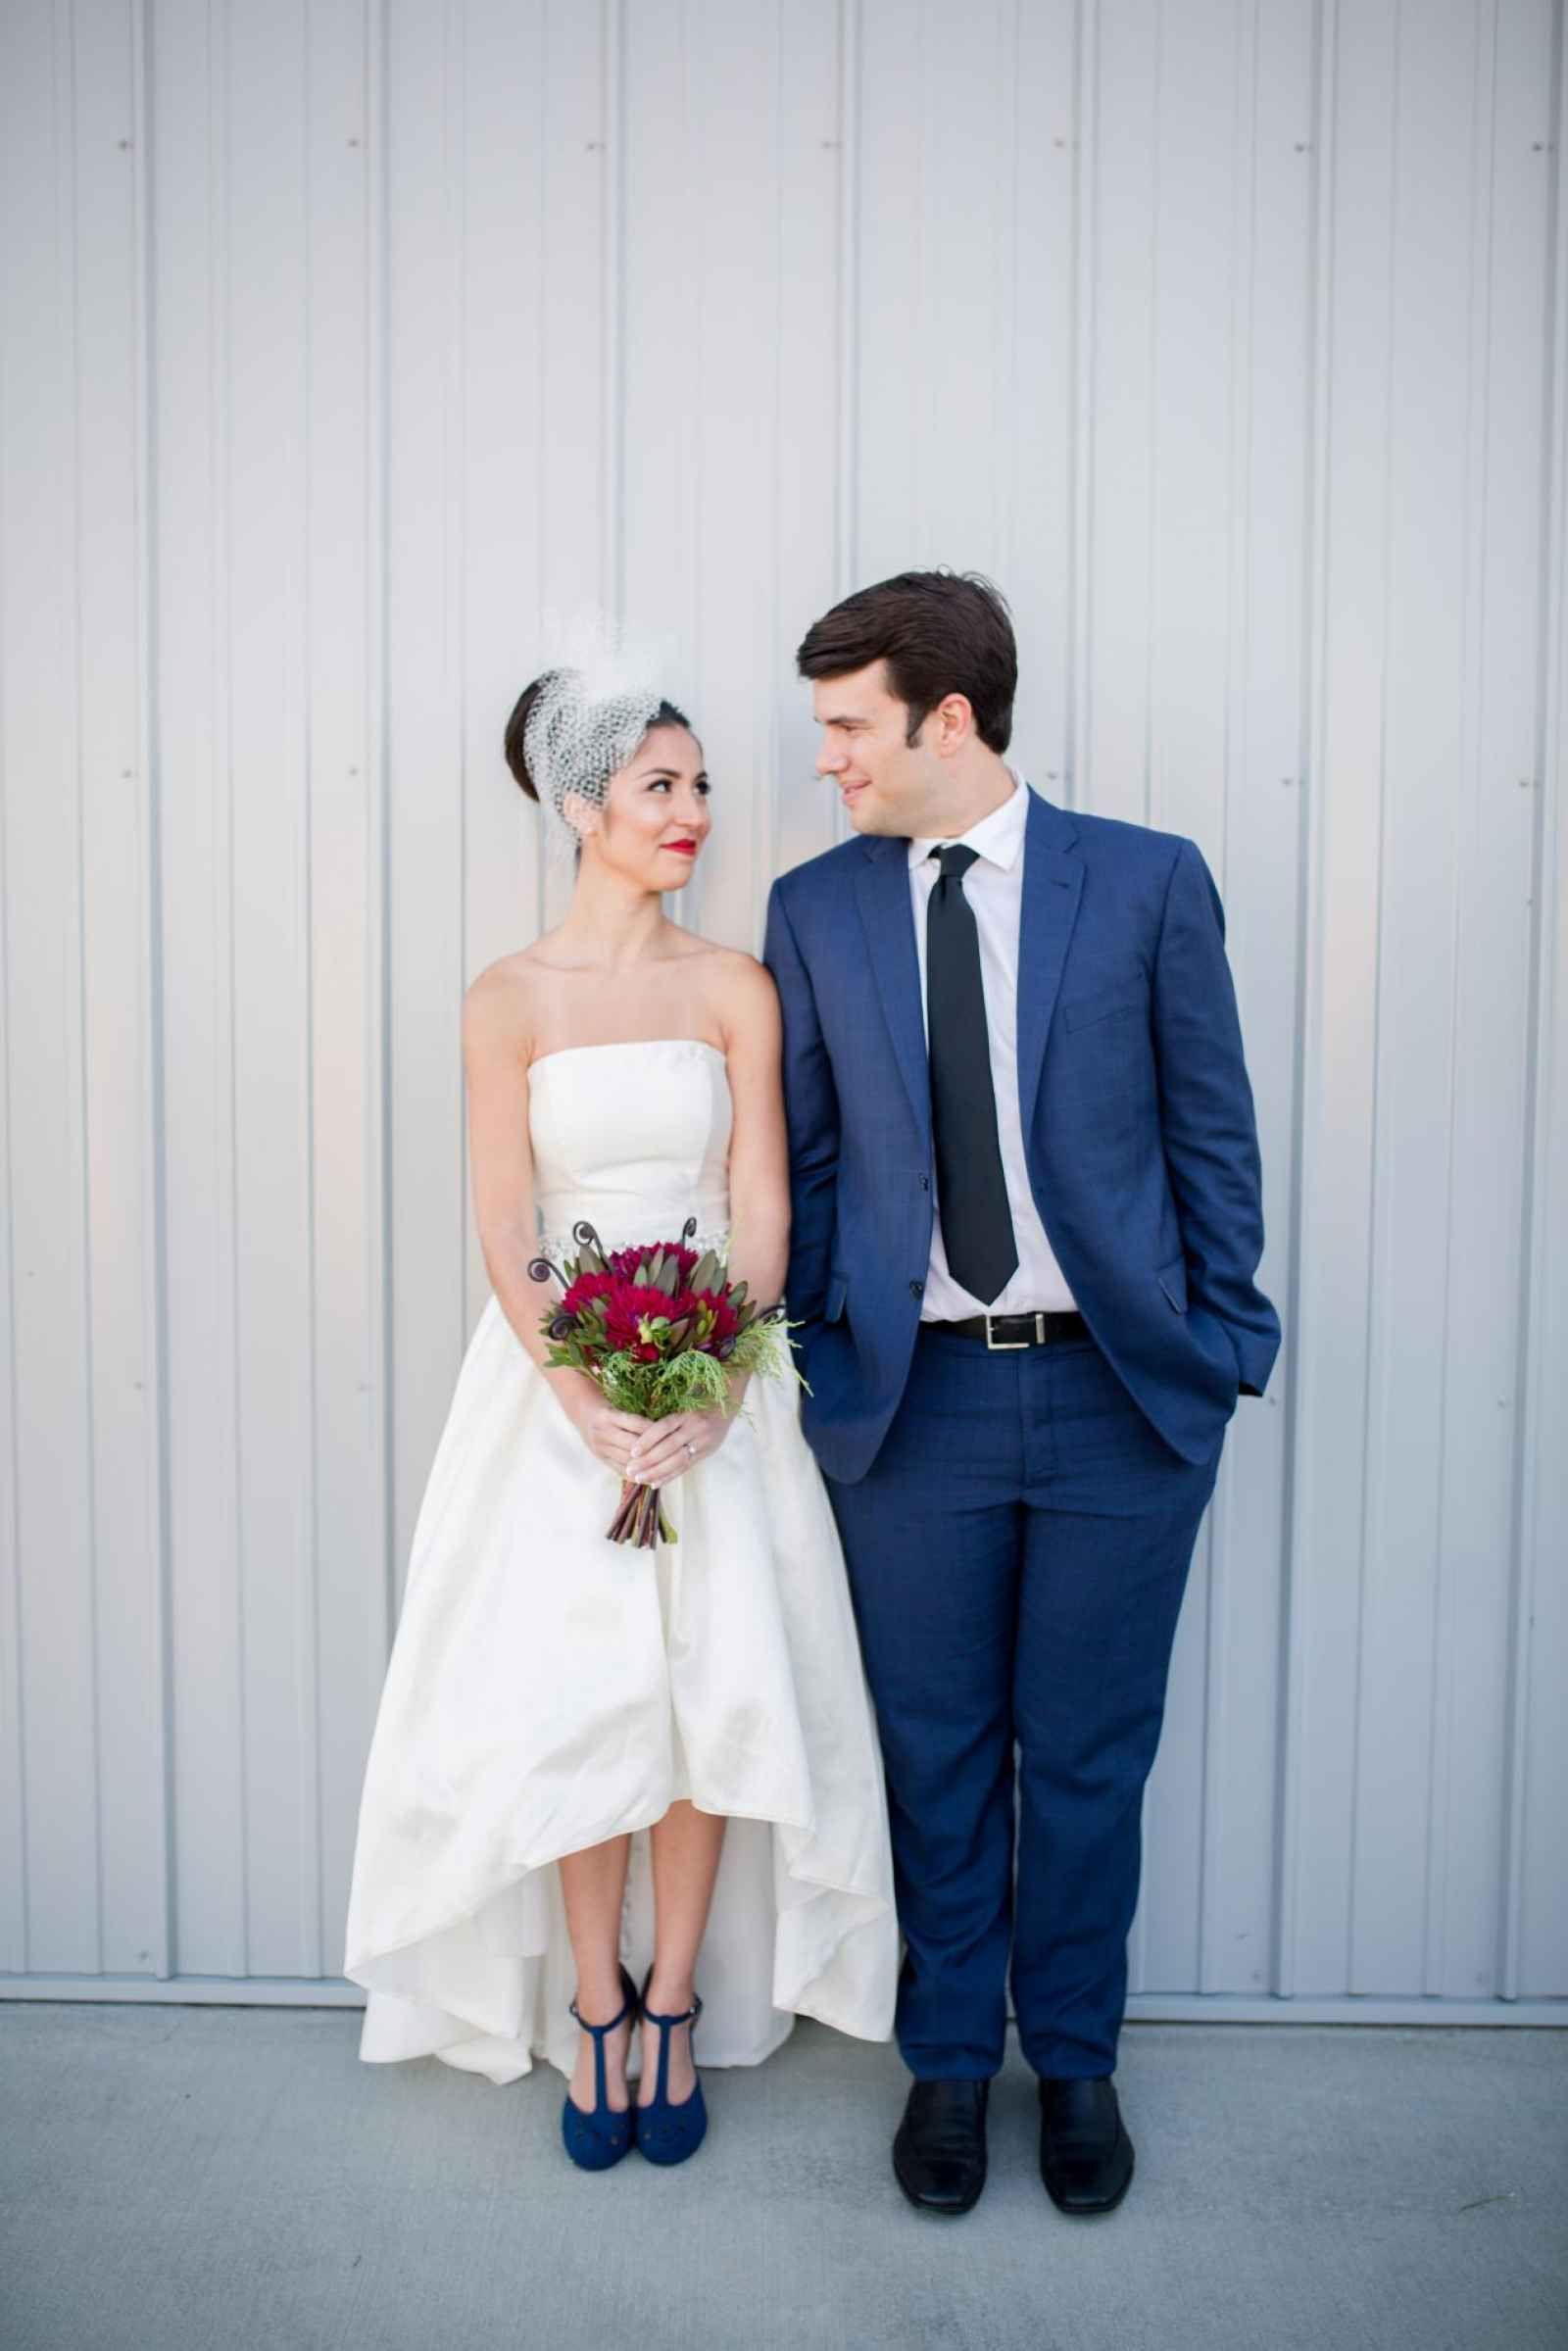 Hi Lo Wedding Gown Blue Wedding Shoes Vintage Wedding Look Weddingday Magazine Wedding Looks Wedding Shoes Vintage Elopement Styling [ 2399 x 1600 Pixel ]